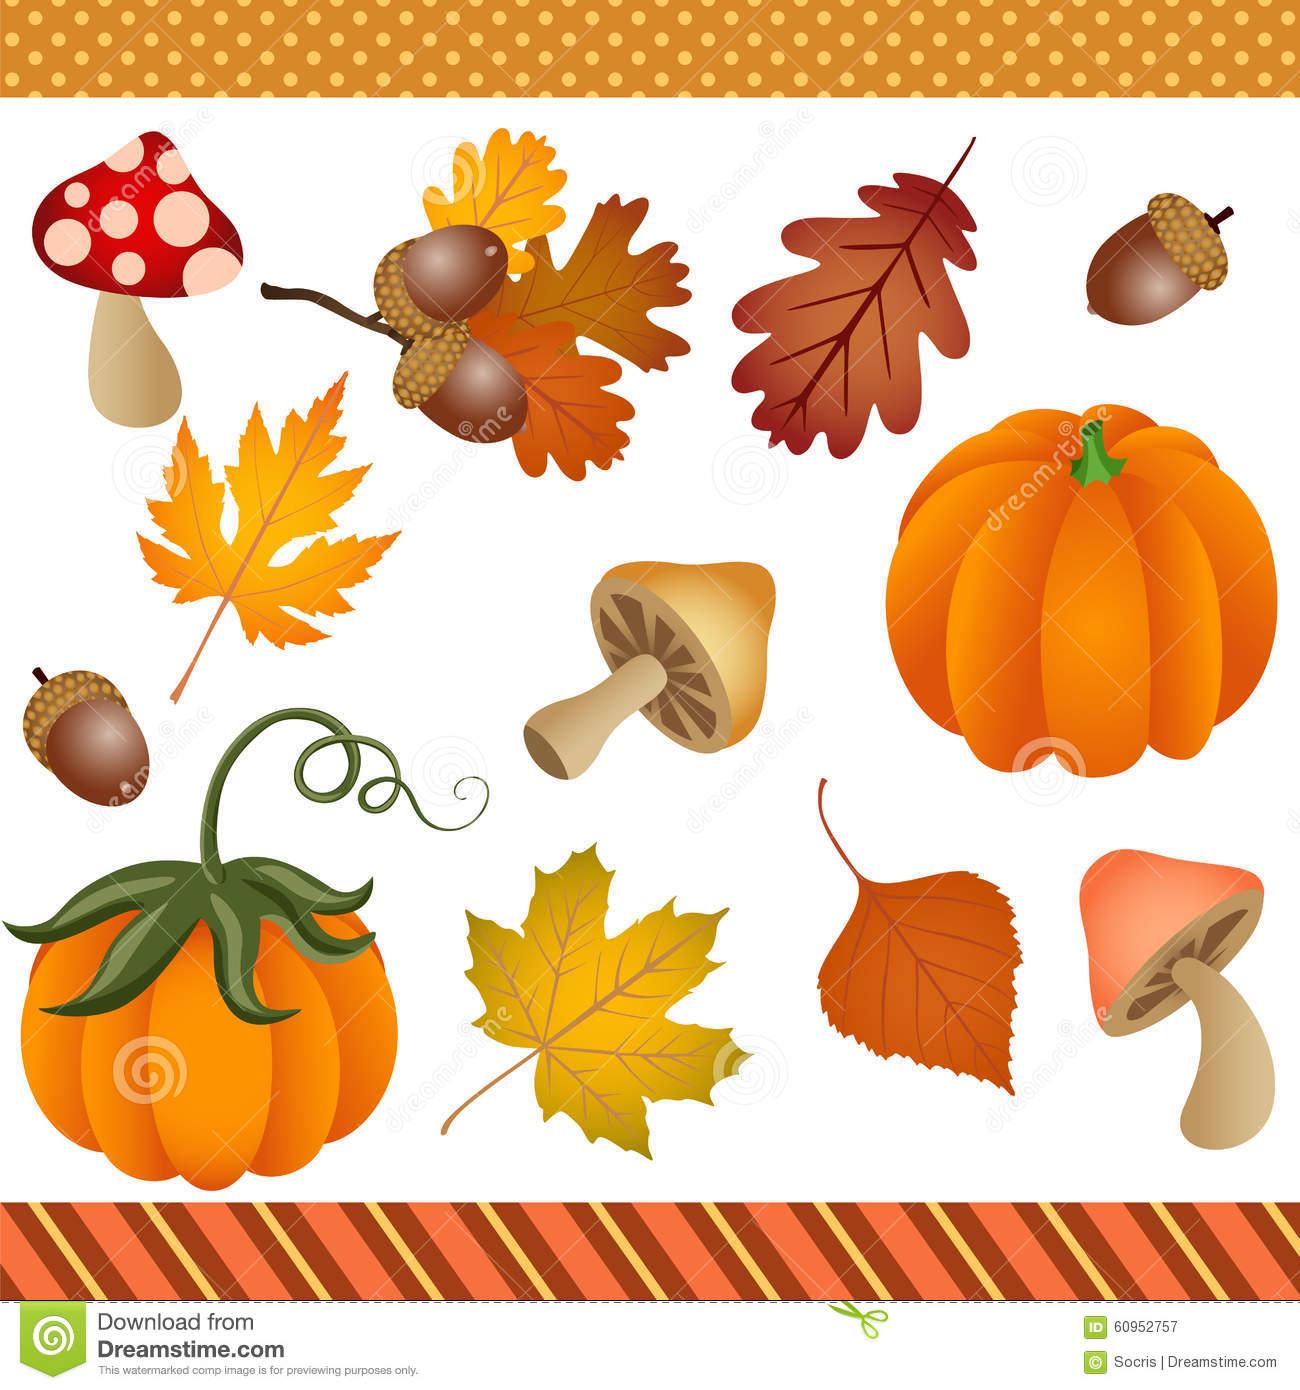 Fall Autumn Clipart Digital Stock Vector.